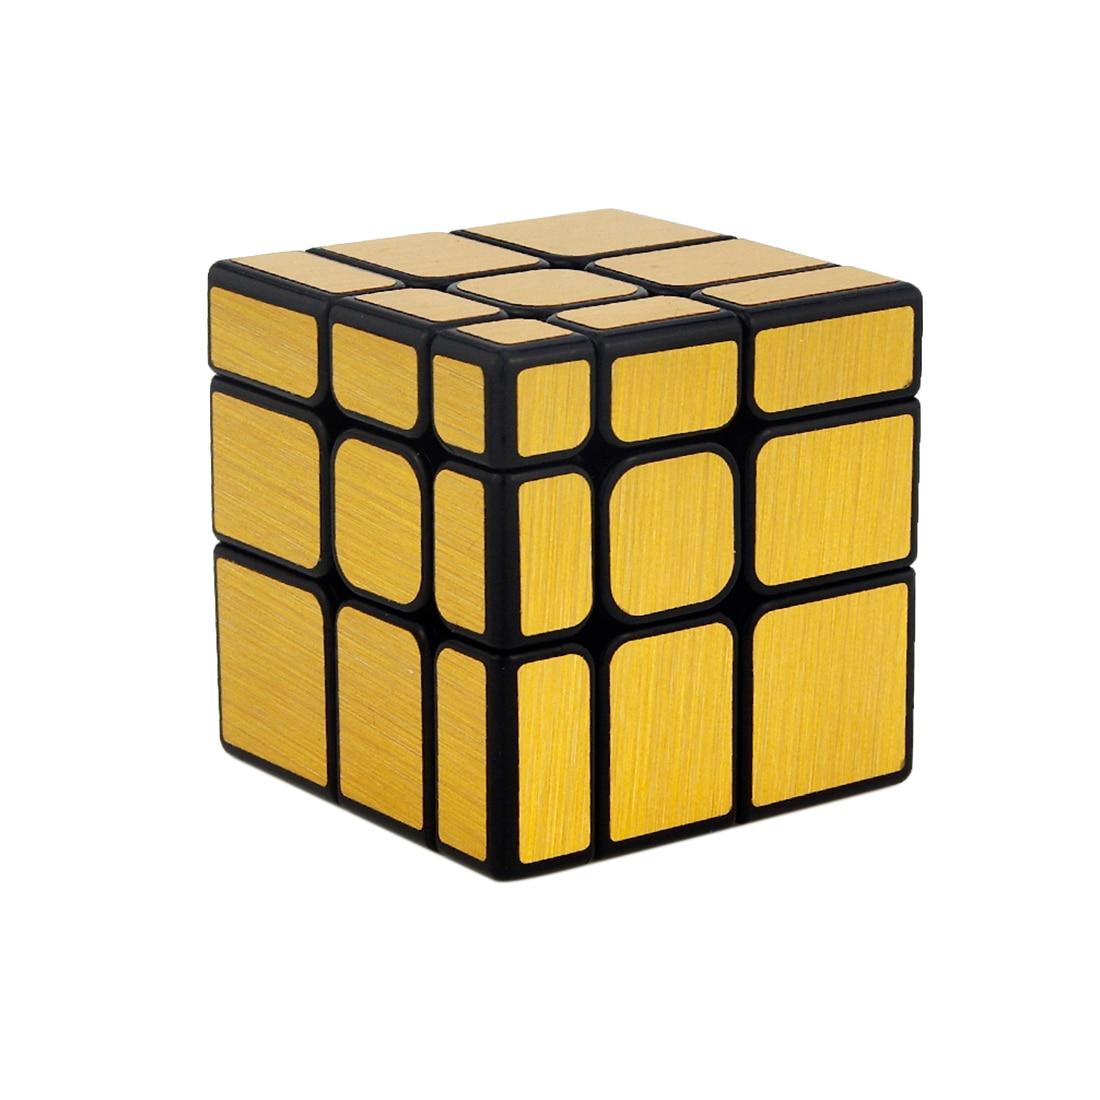 MoFang JiaoShi MF8811 3x3x3 Speed Mirror S Cubing Classroom Puzzle Magic Cube 57mm - Silver